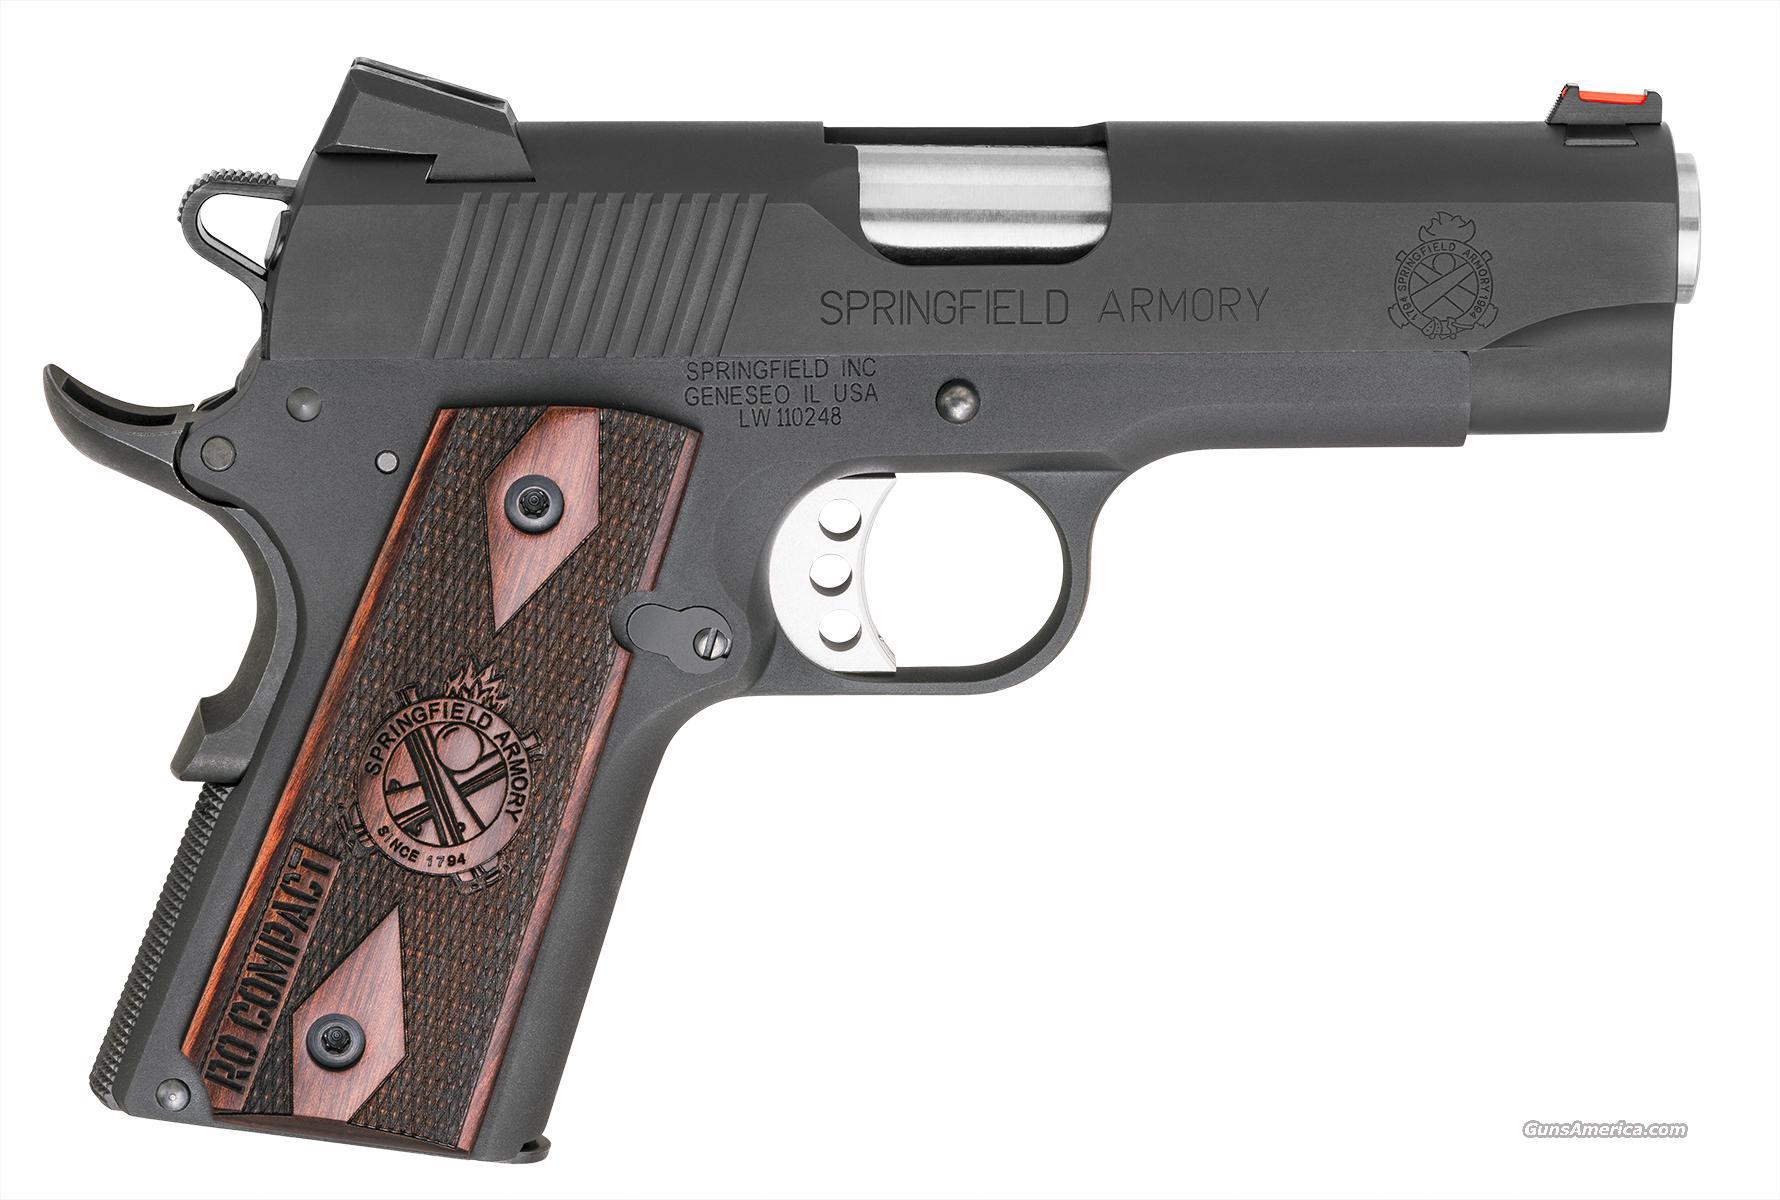 "Springfield Compact Range Officer LW .45 acp 4"" Fiber Optic *NEW*  Guns > Pistols > Springfield Armory Pistols > 1911 Type"